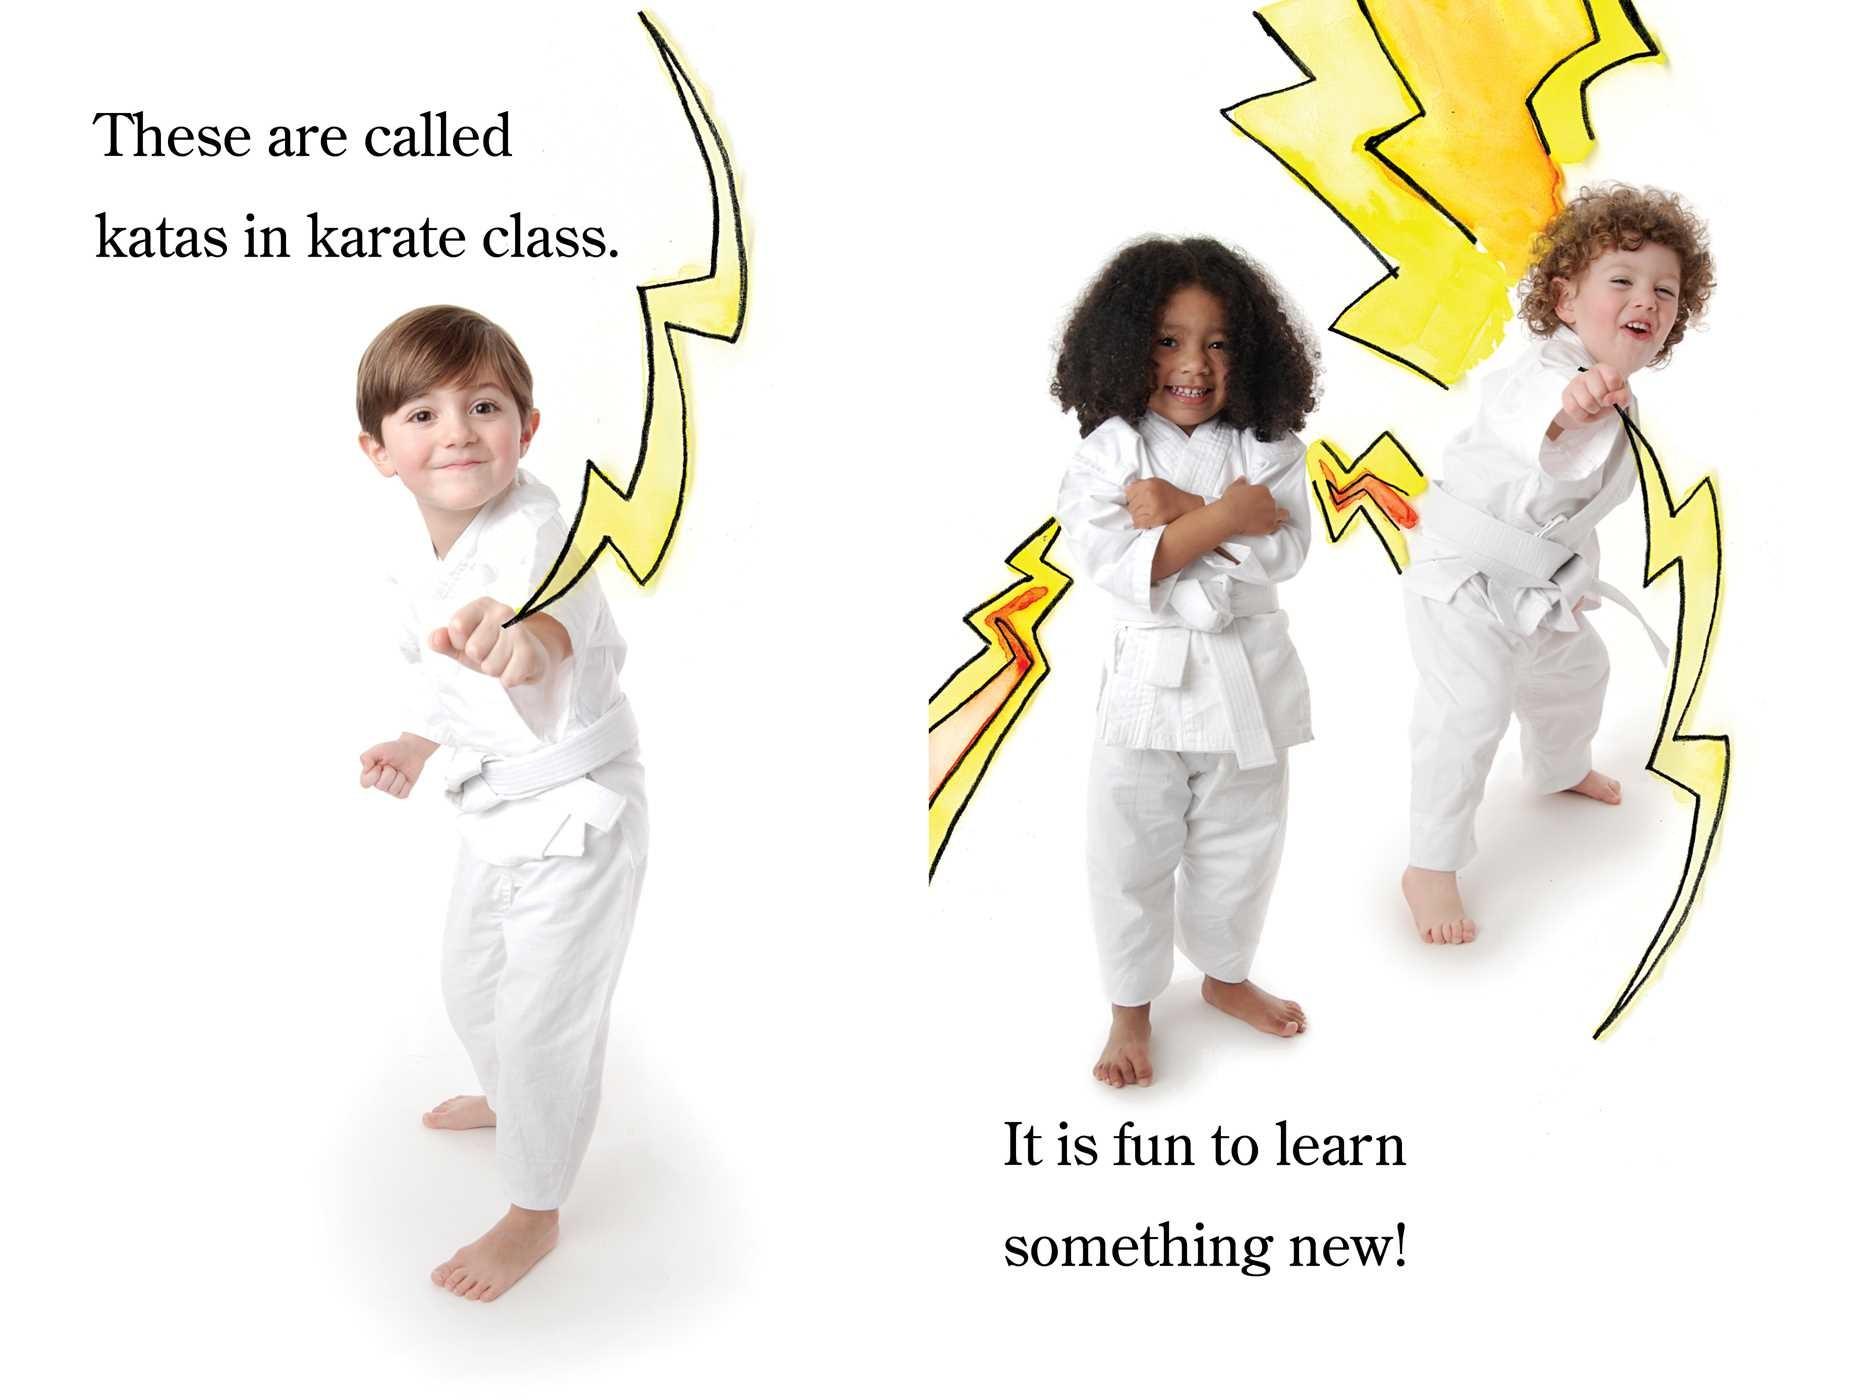 My first karate class 9781481479318.in04